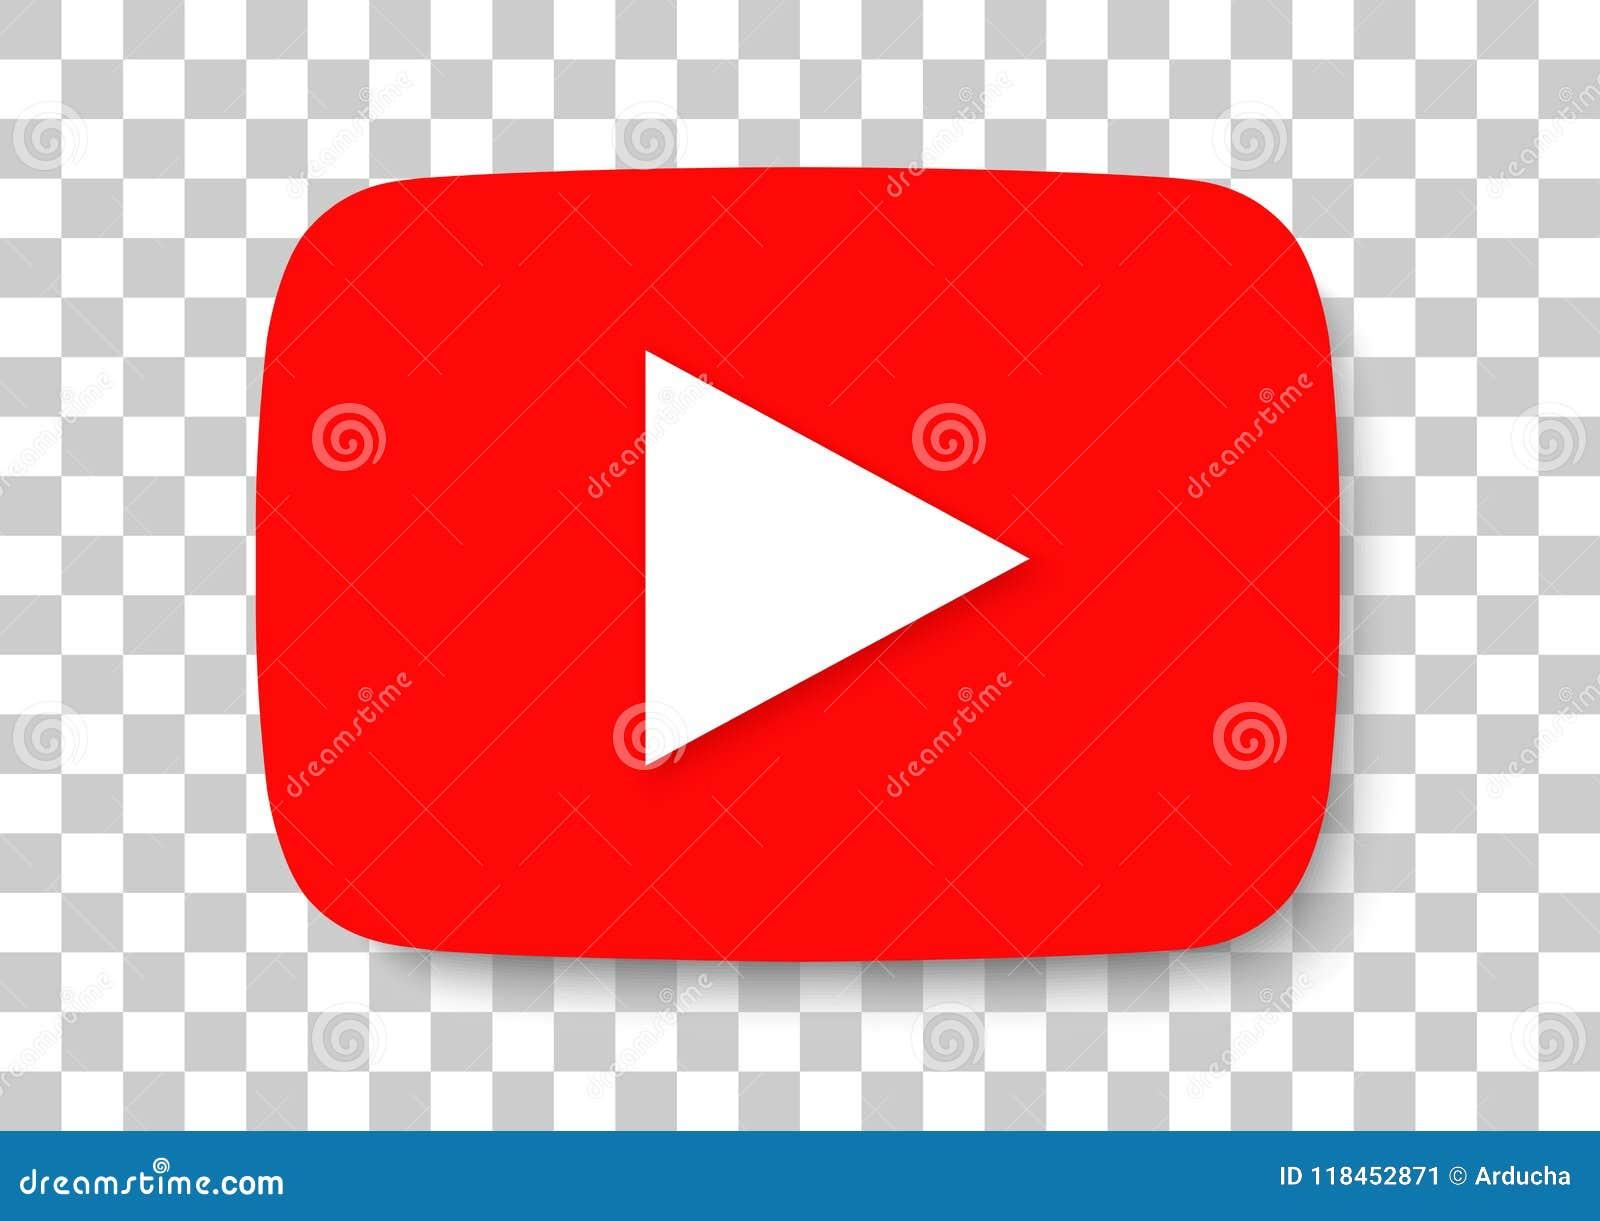 Youtube apk icon editorial photo  Illustration of social - 118452871